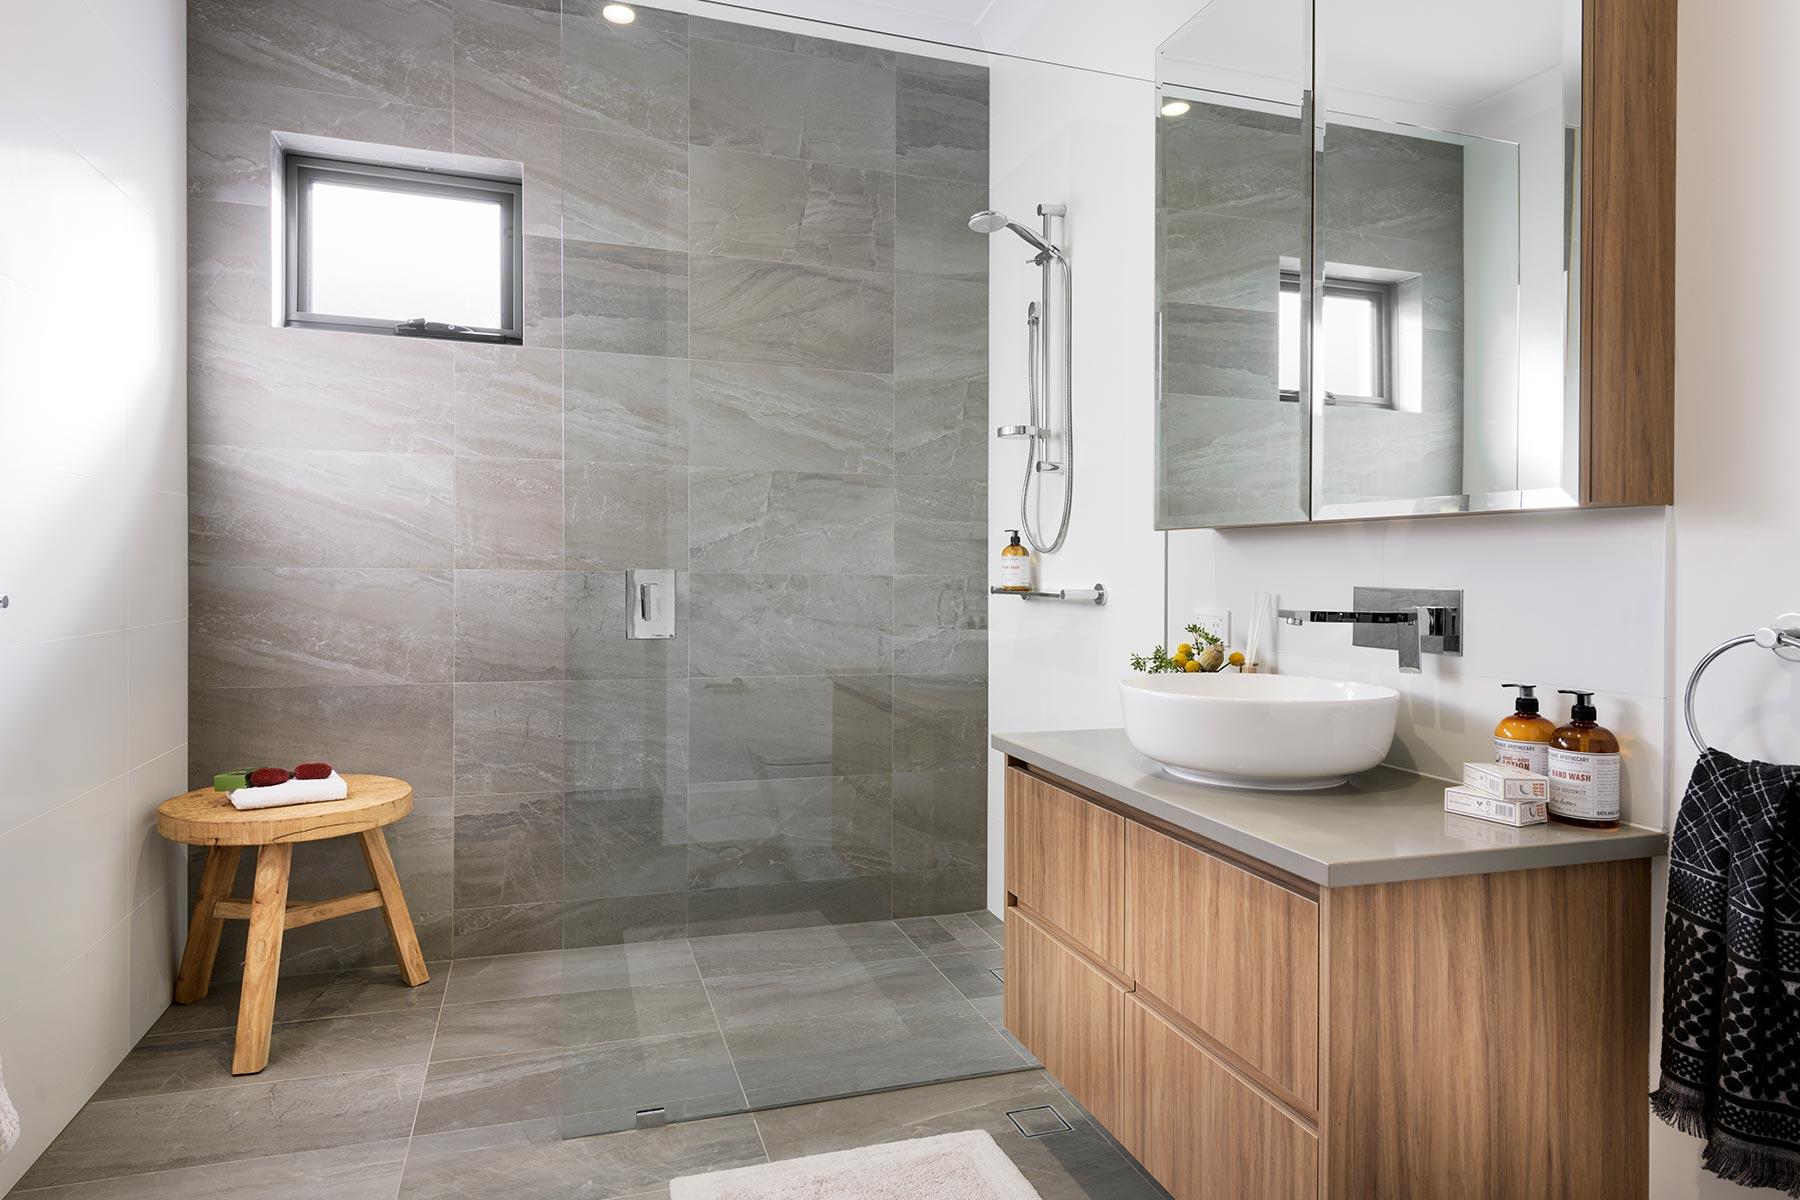 Livable-Housing-Assessor-Perth-OHA-Aspire-Calleya